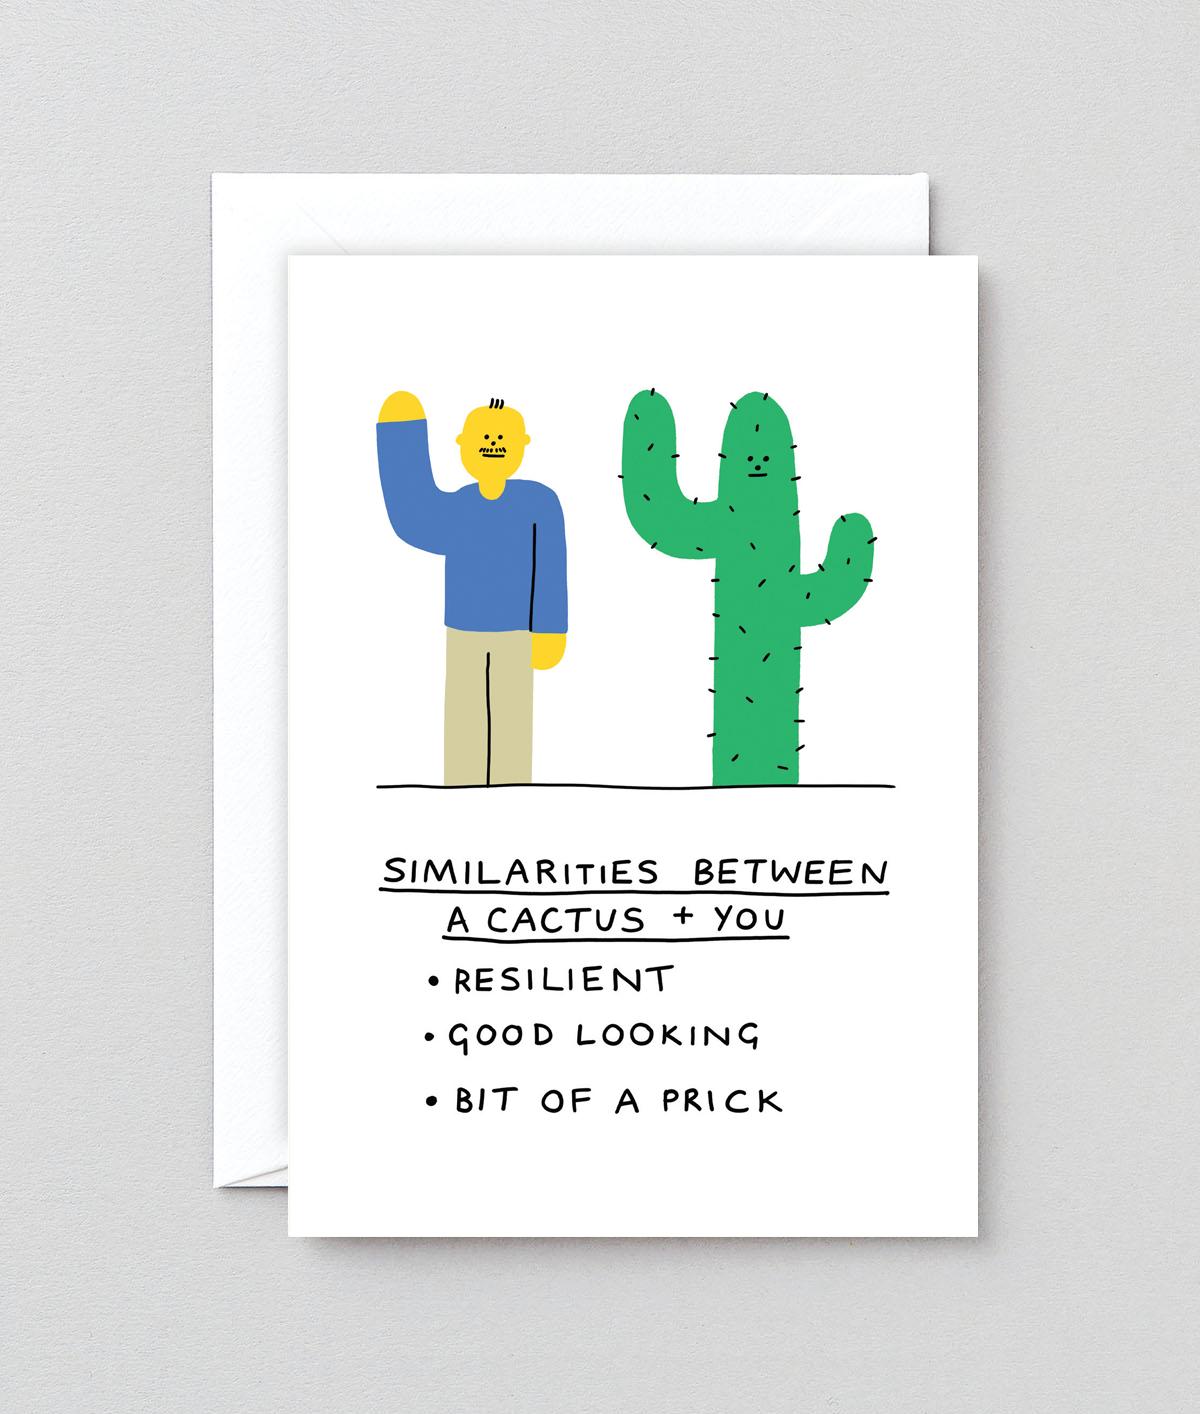 Cactus vs You